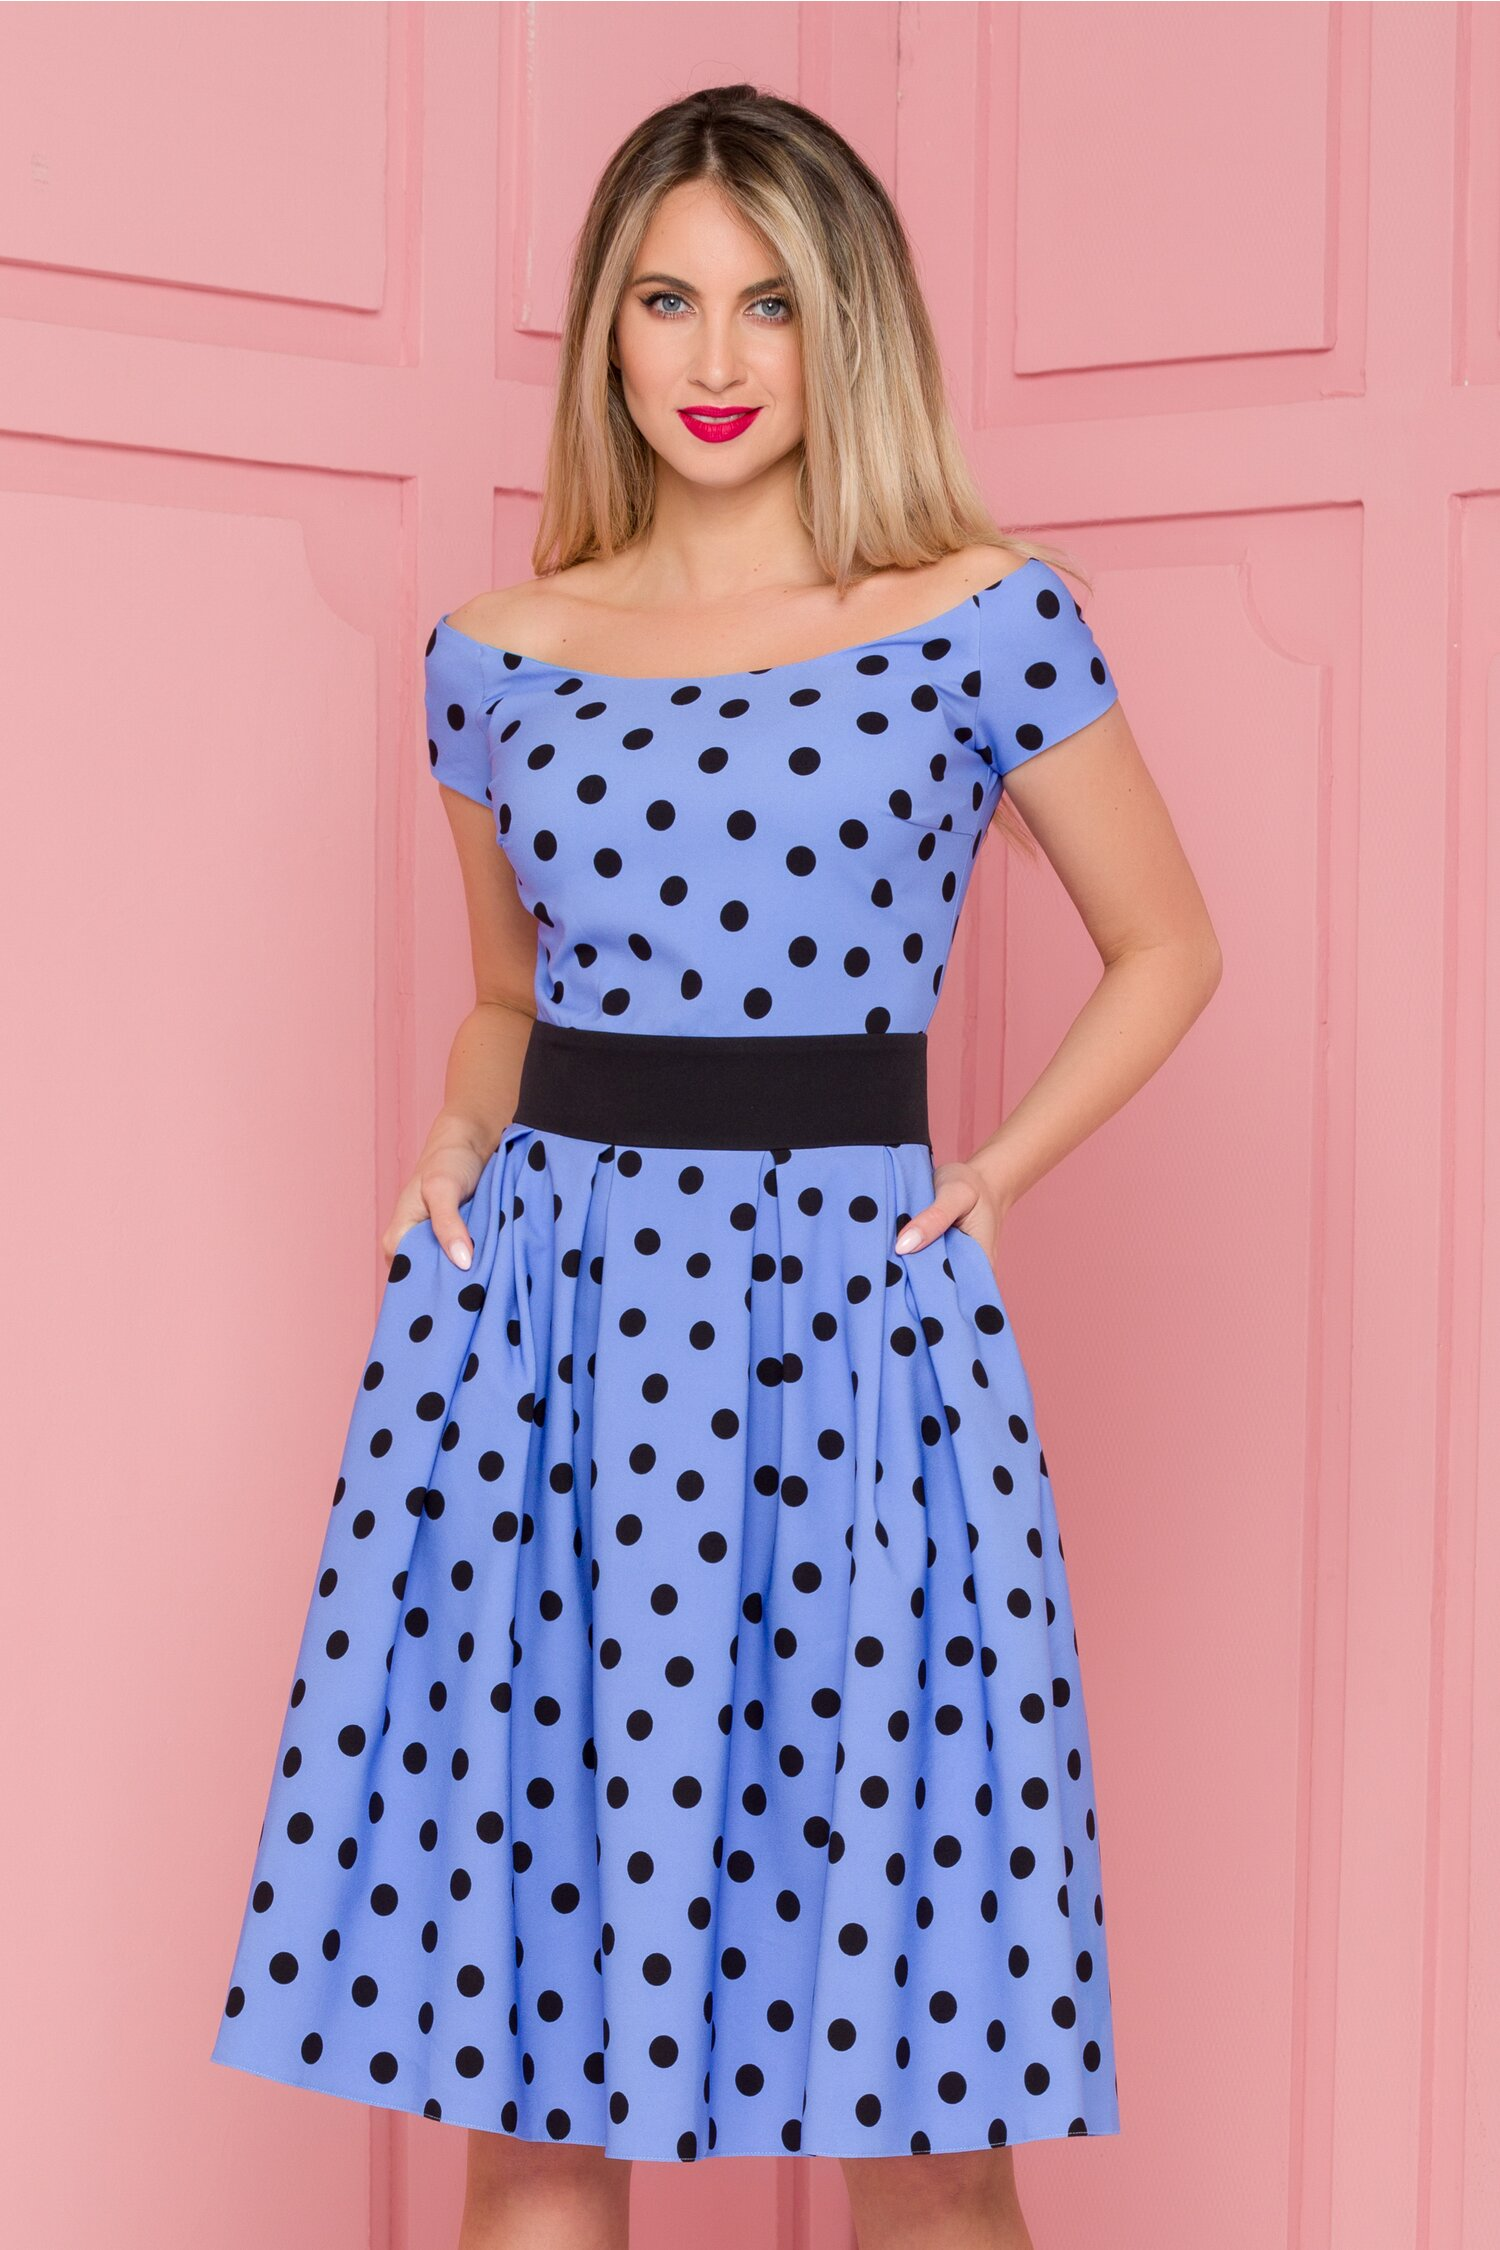 Rochie LaDonna albastra imprimata cu buline negre